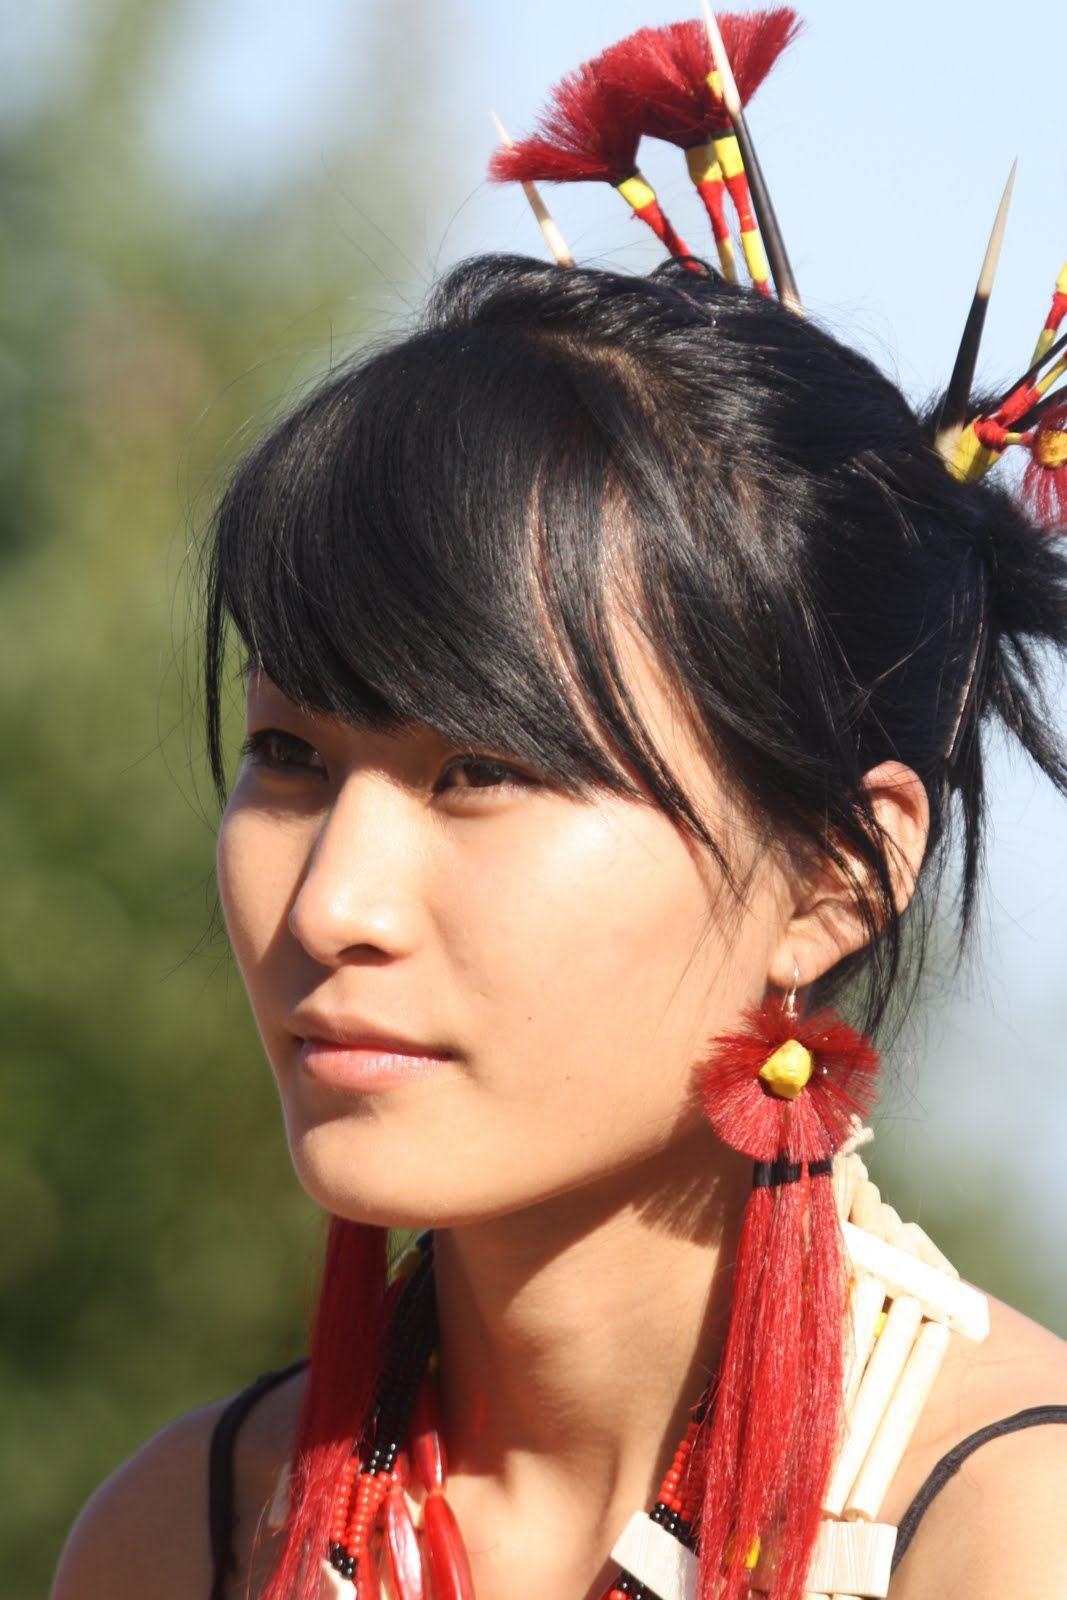 Nagalandgirlpussy hentai scenes